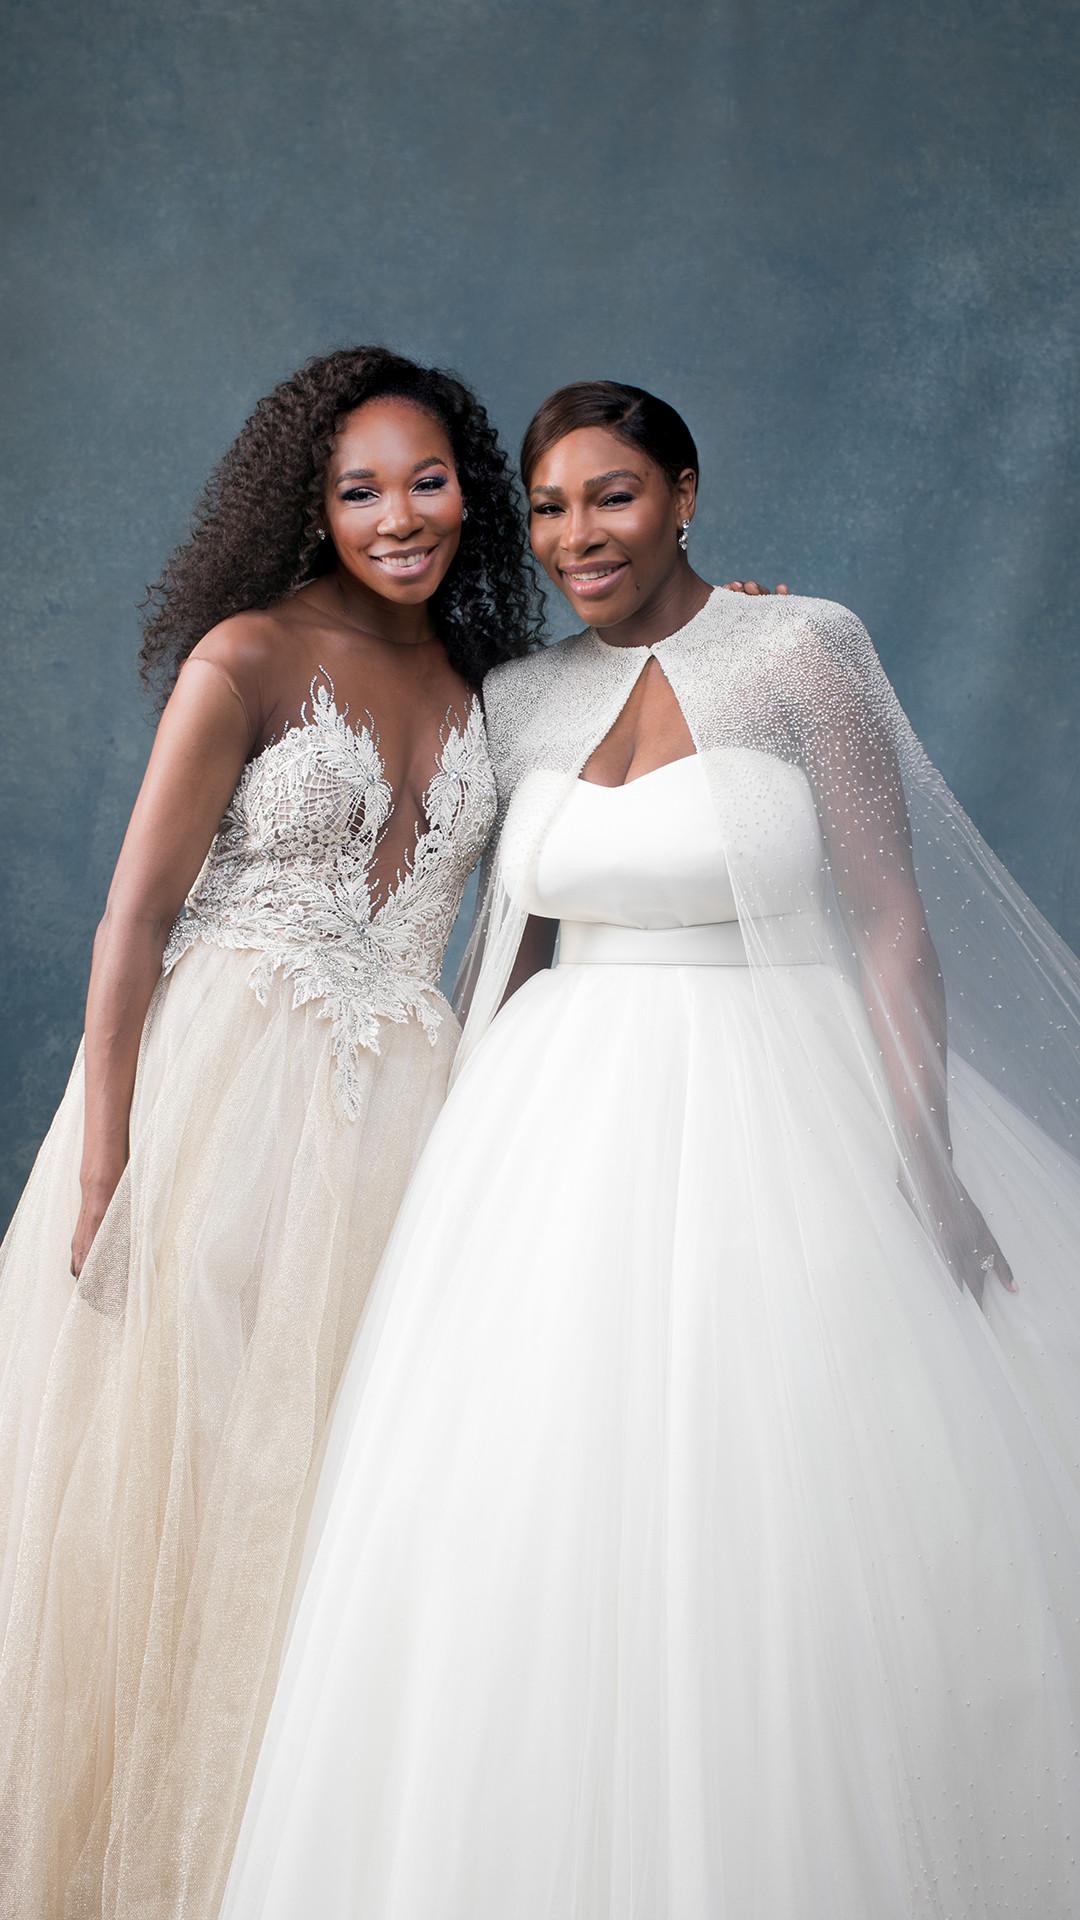 Serena Williams, Alexis Ohanian, Venus Williams, Wedding